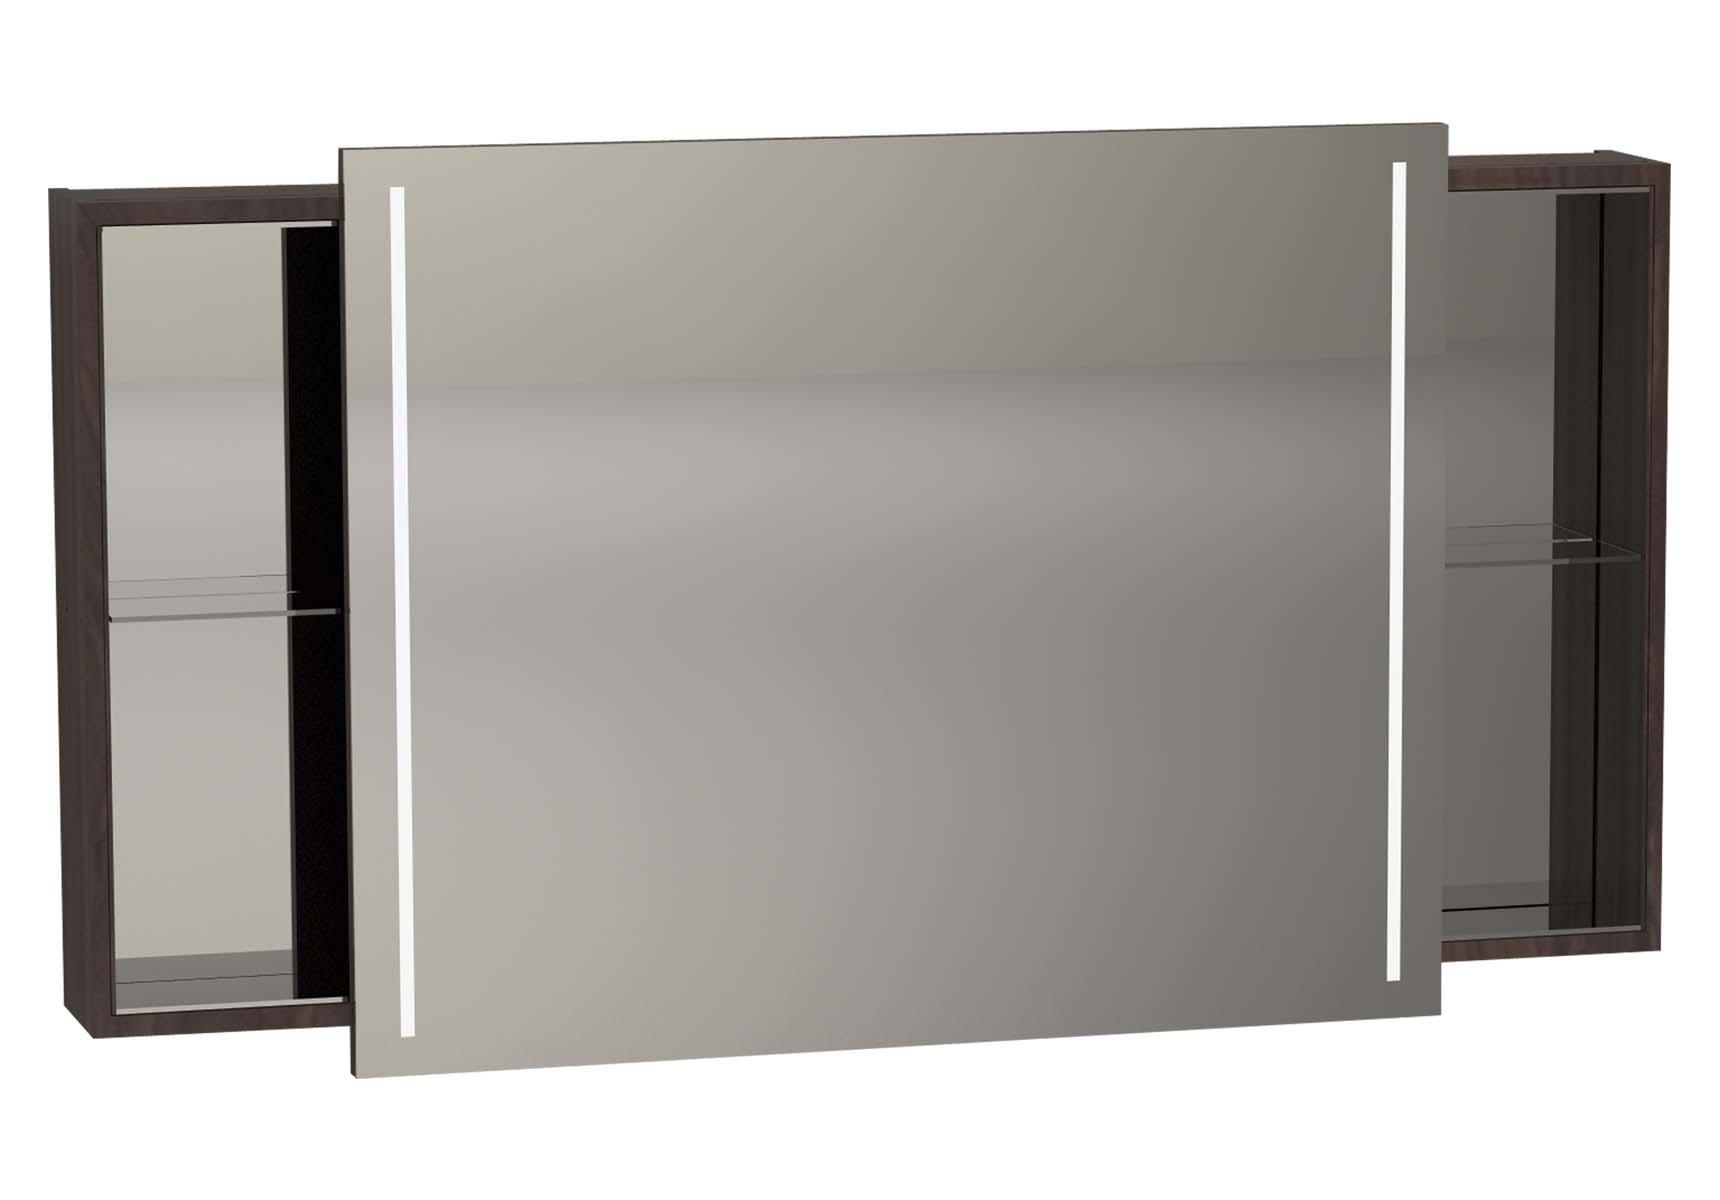 Memoria Illuminated Mirror Cabinet, 120 cm, Matte Walnut